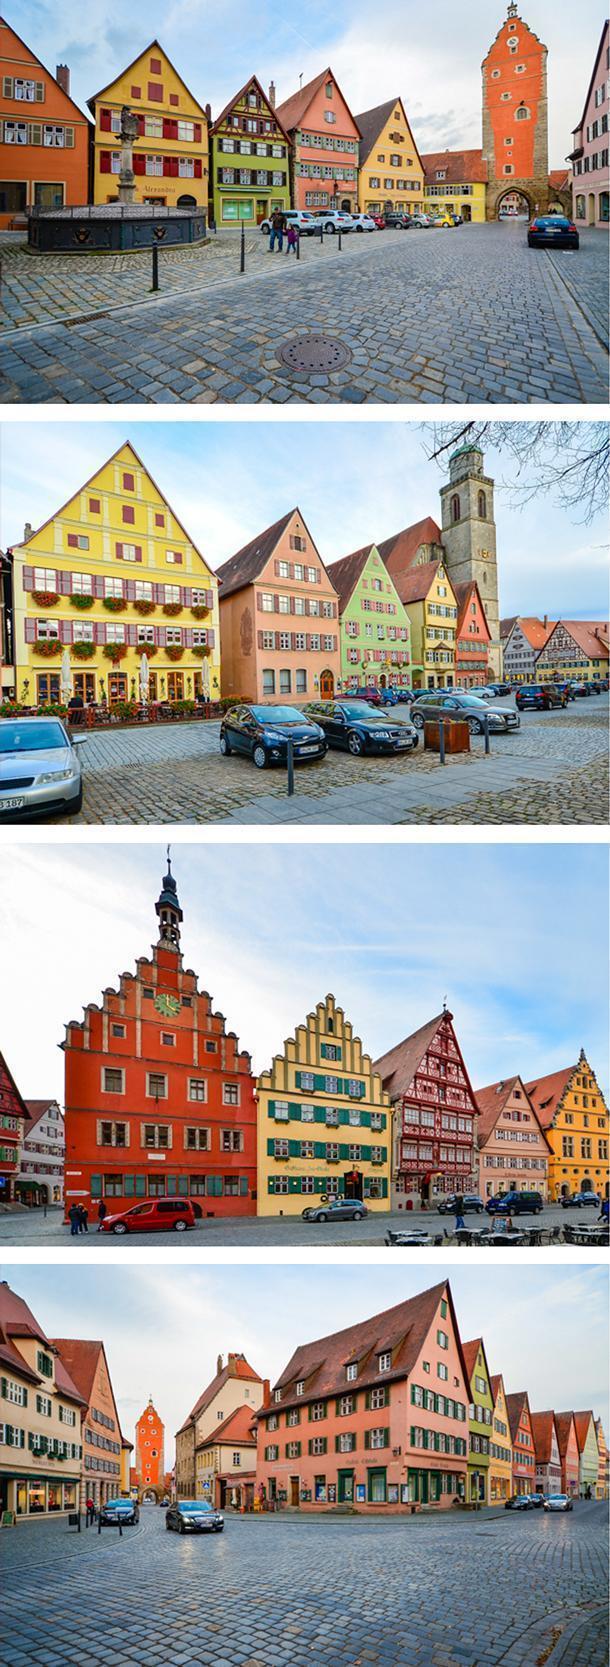 The pretty Weinmarkt of Dinkelsbuhl, Germany